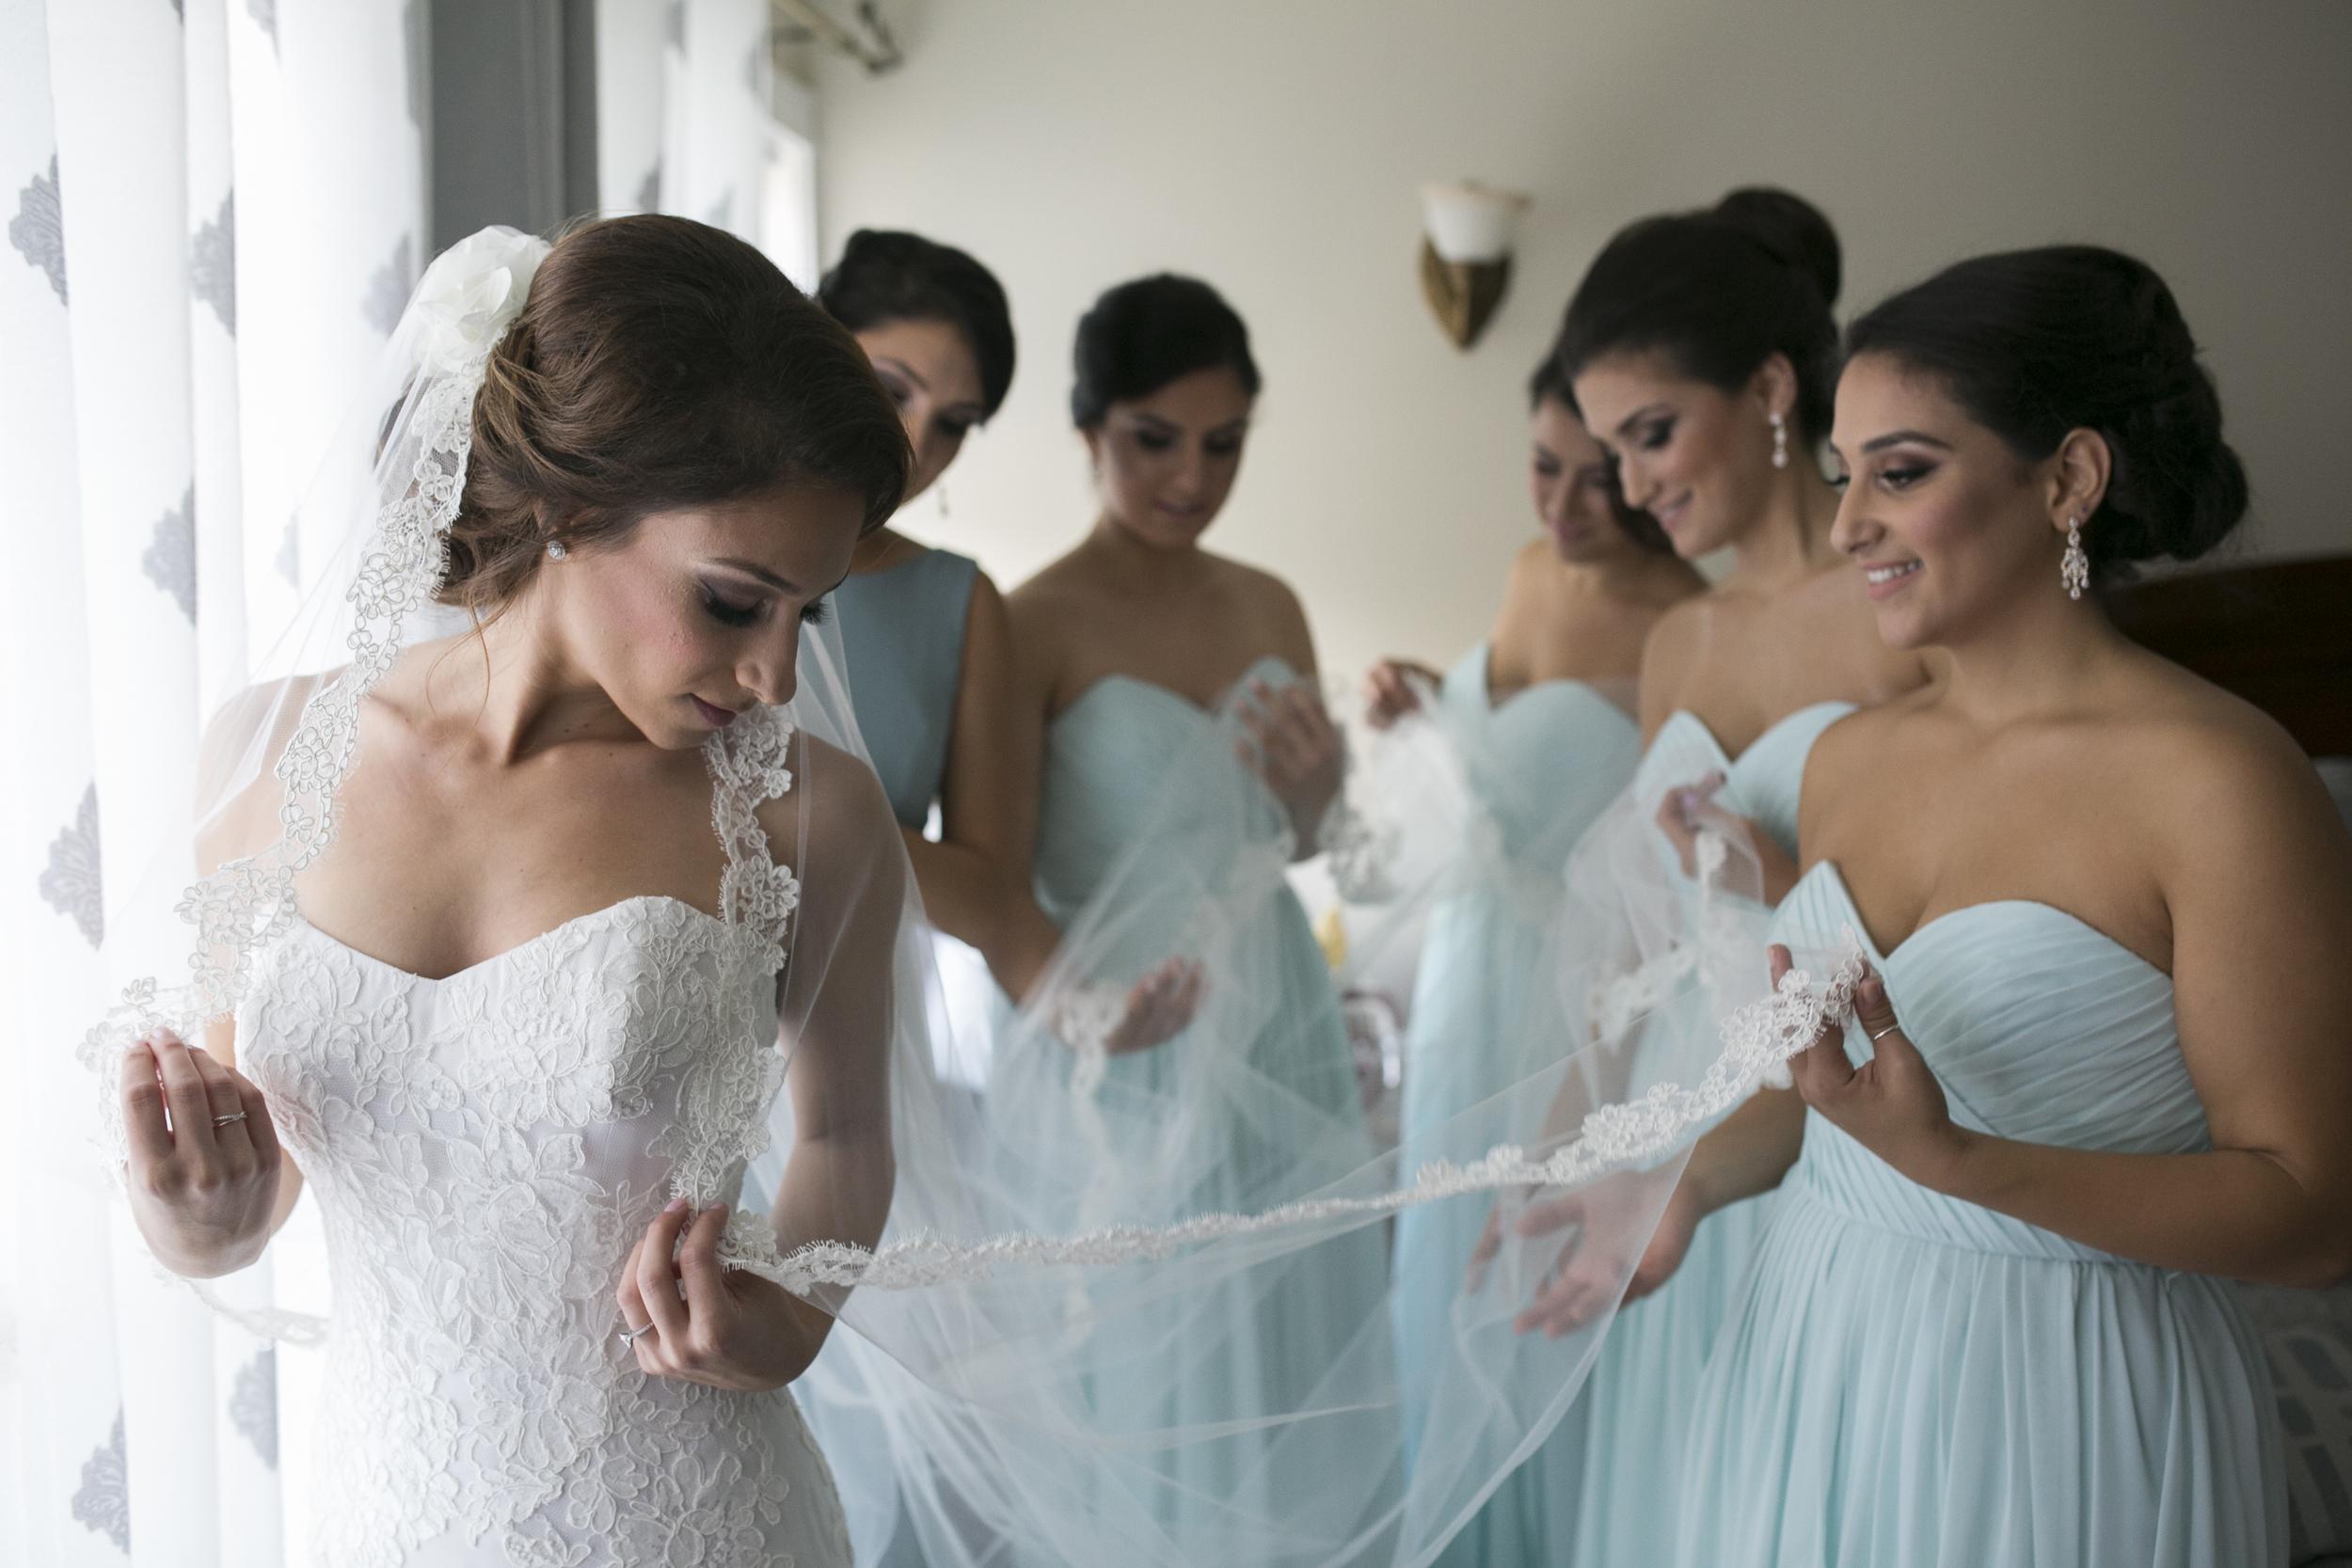 Persian Wedding-South San Francisco-Meo Baaklini16.jpg